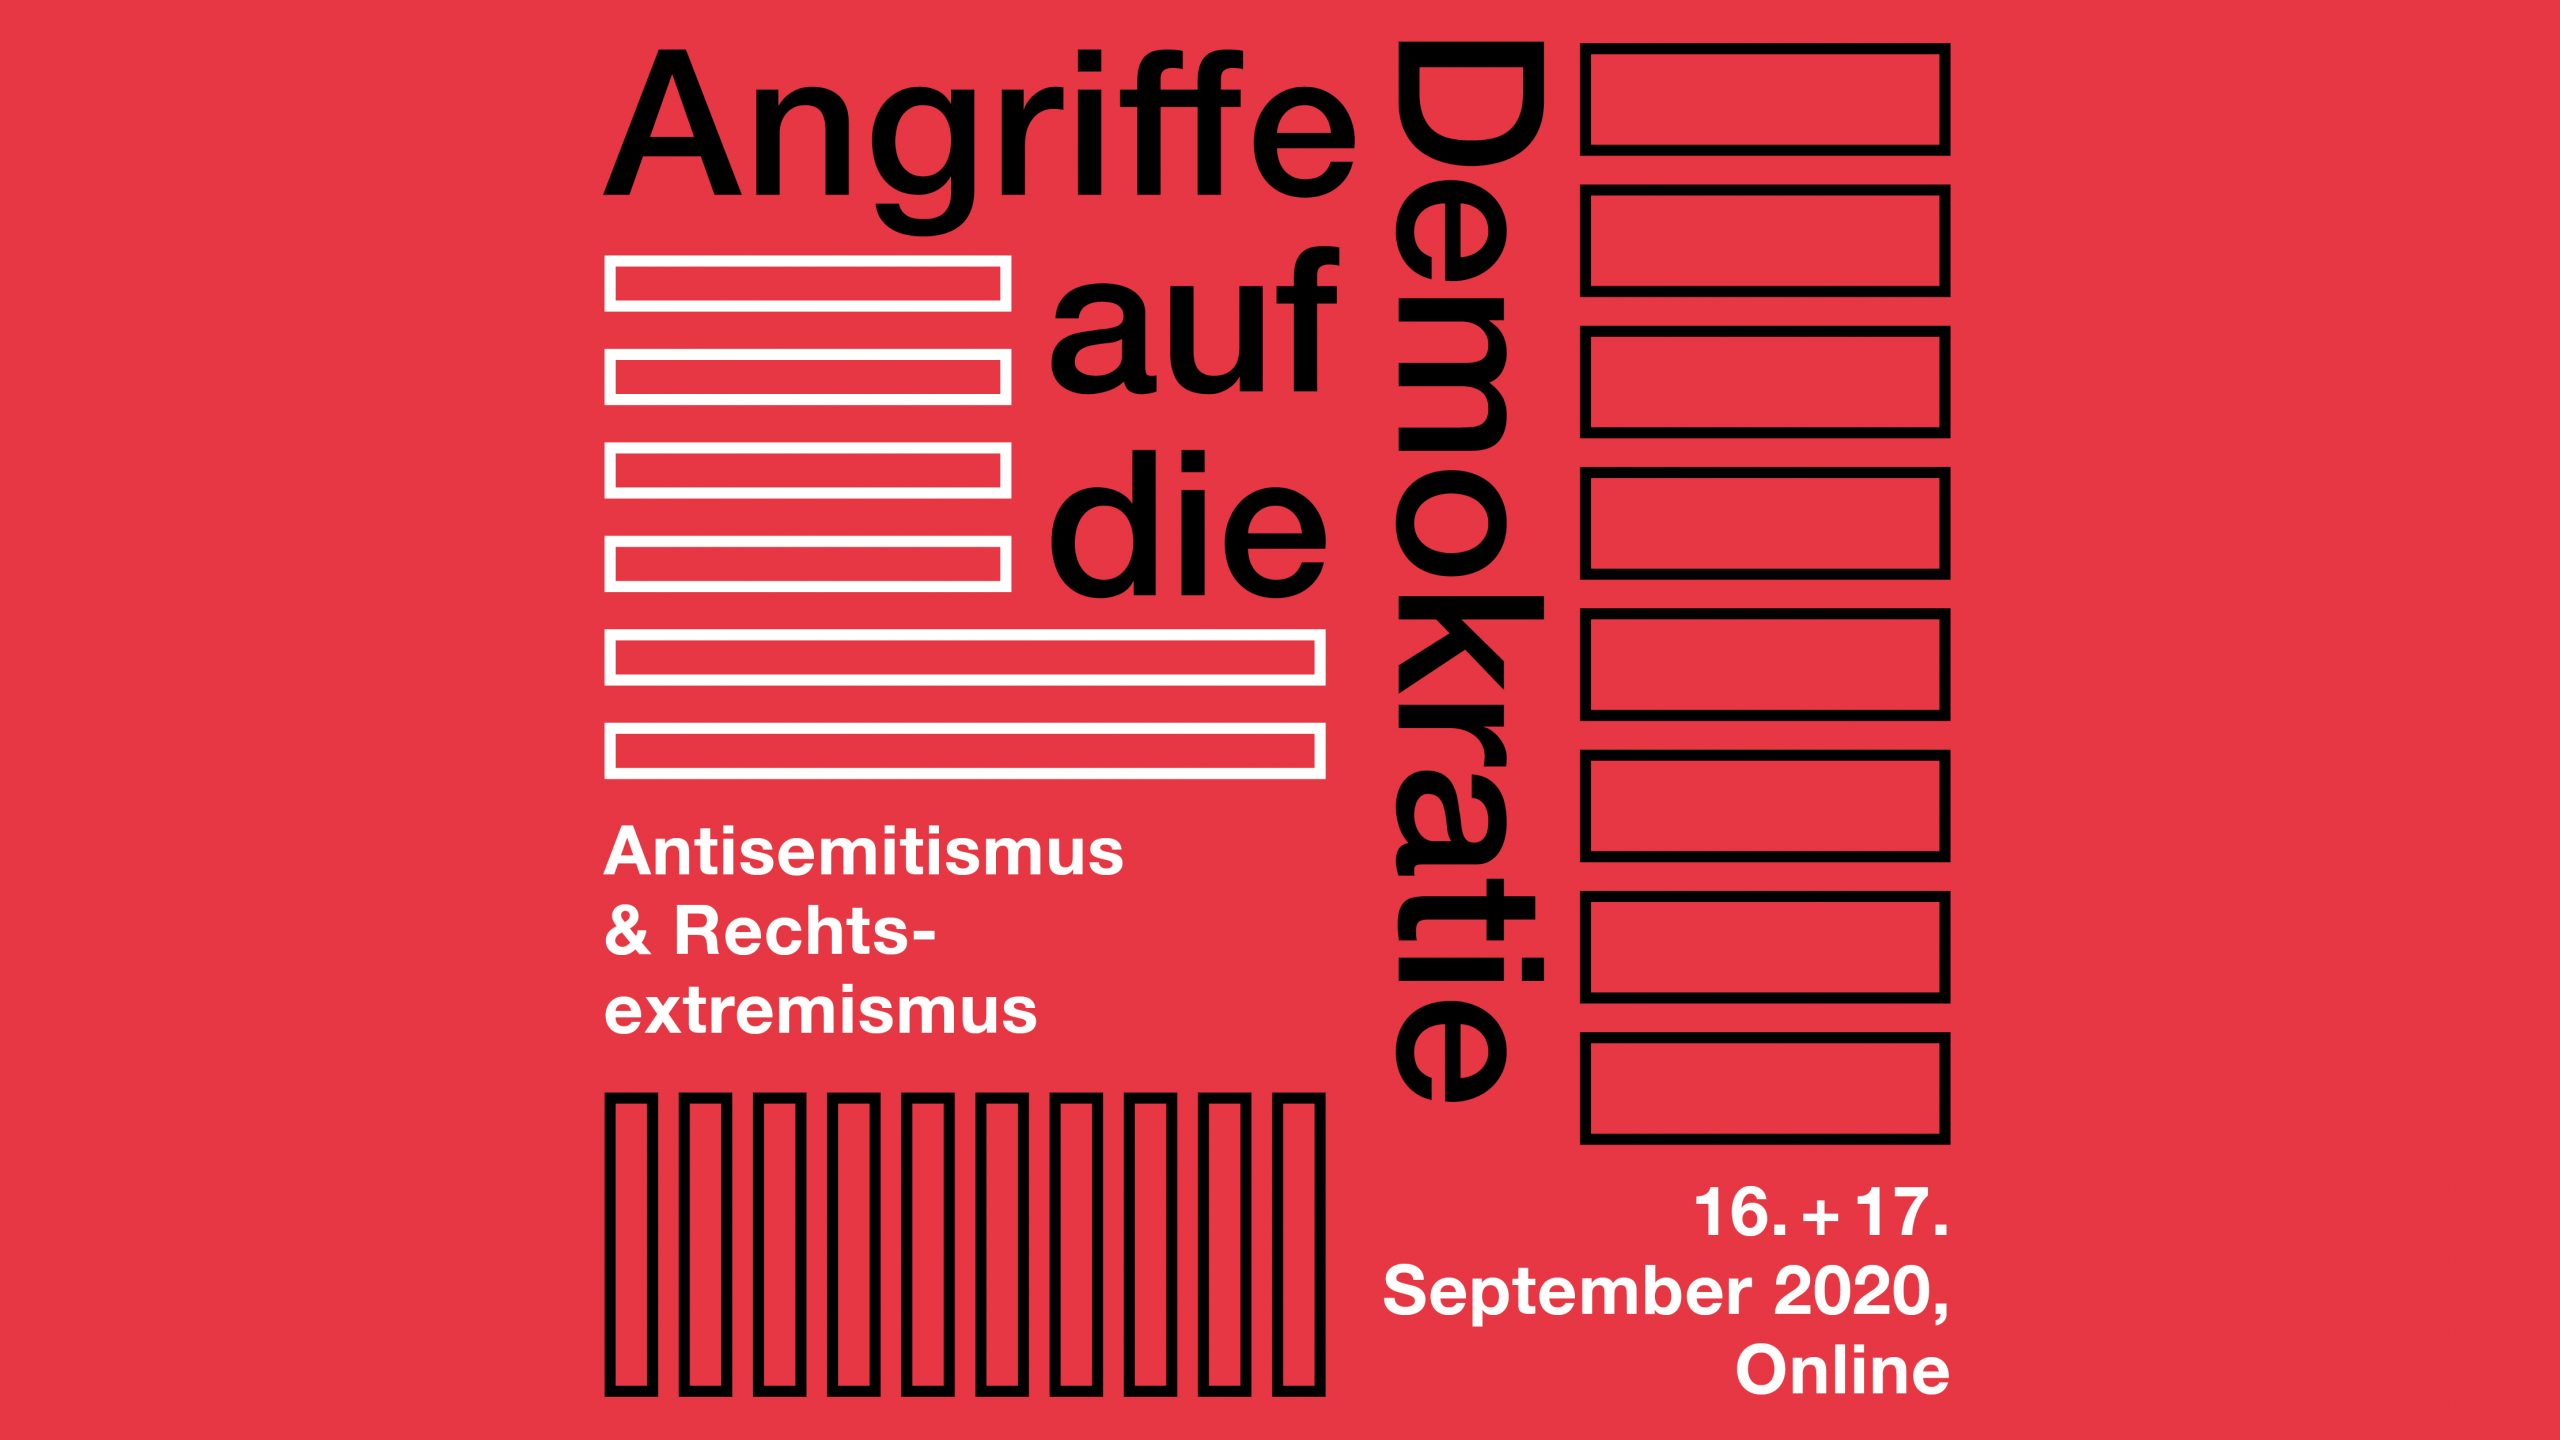 Angriffe-Demokratie-Tagung_16_9